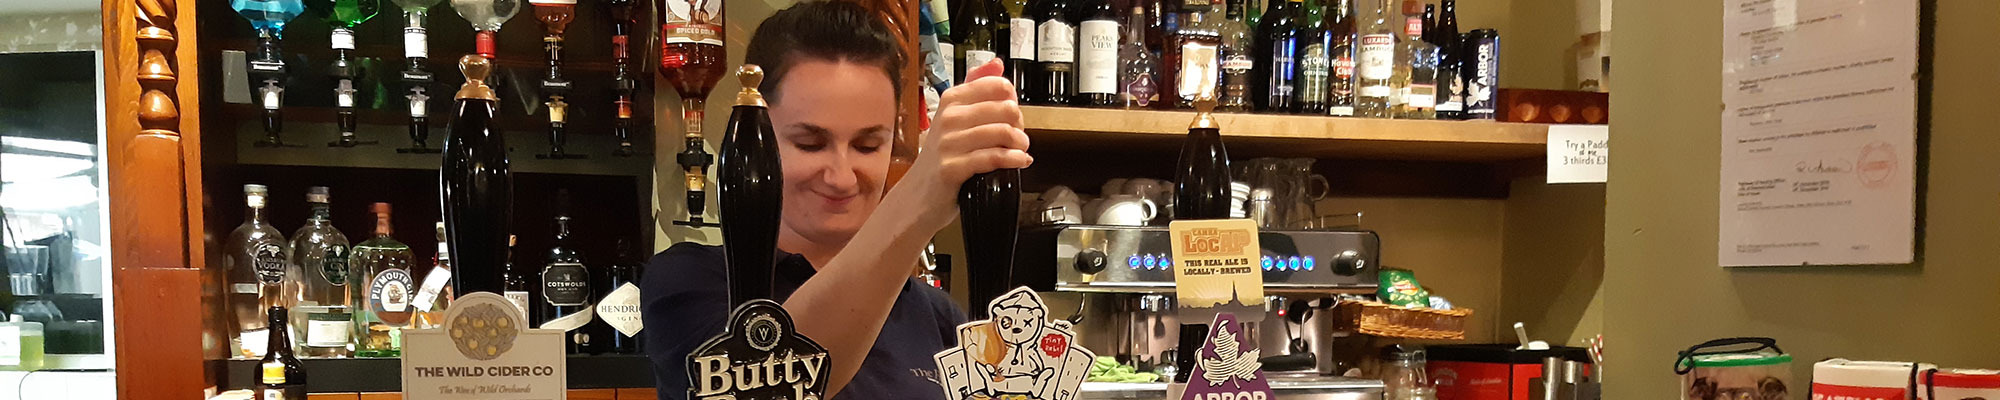 The Fleece Inn Hillesley - Great beer, friendly service